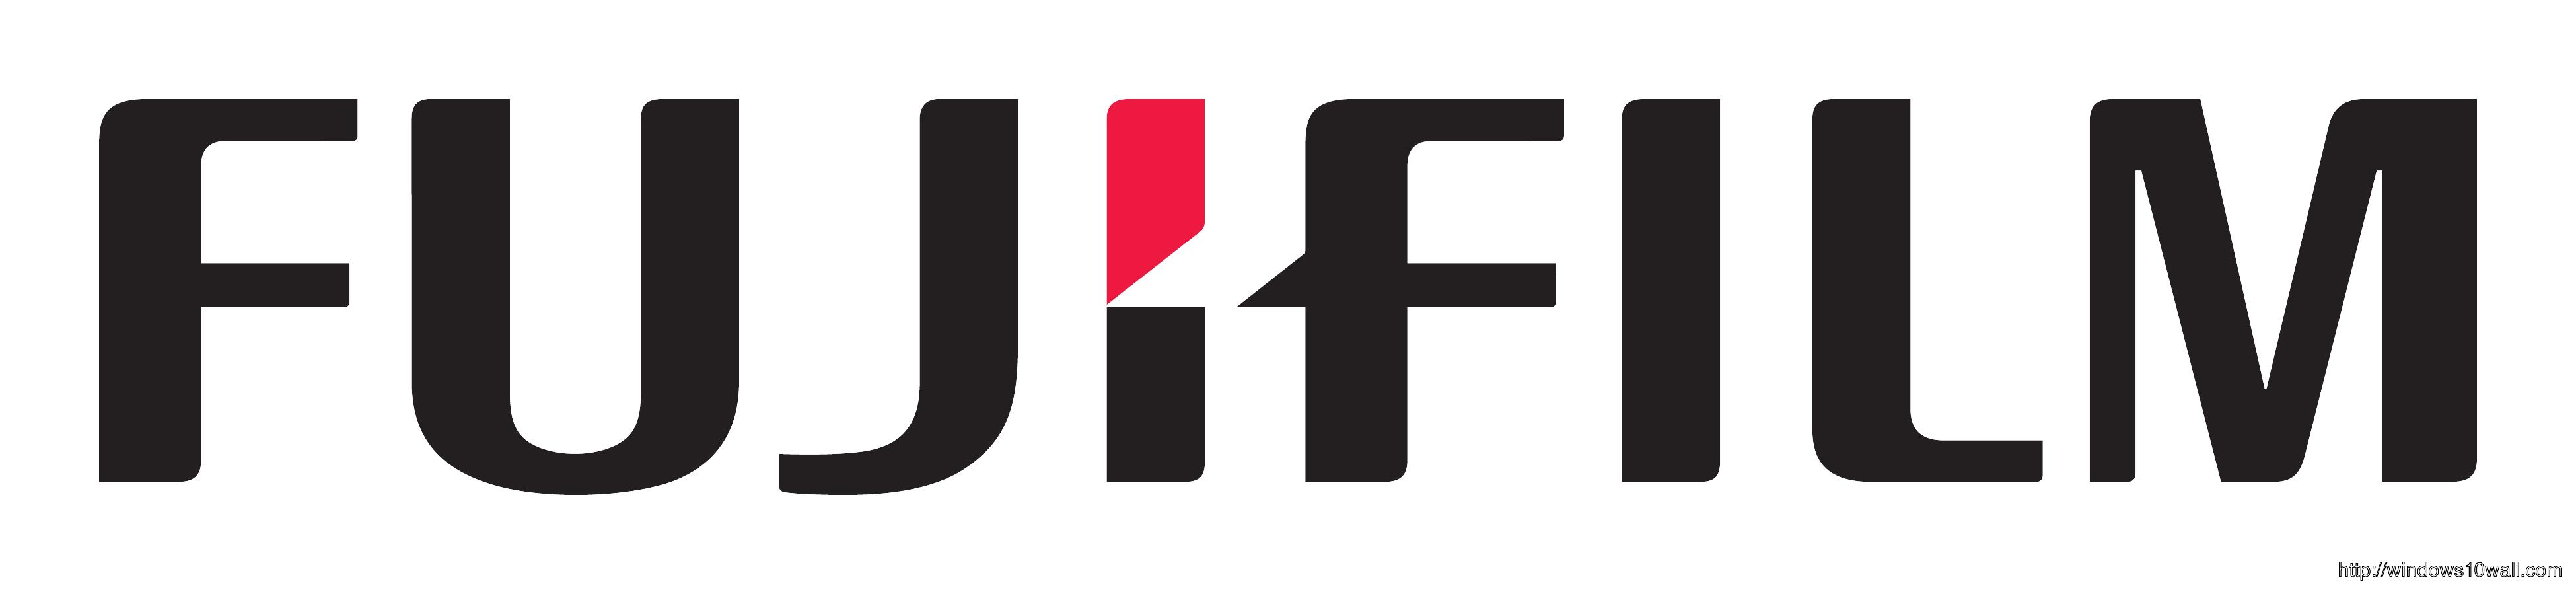 Spongebob Quotes Iphone Wallpaper Company Logo Collections Fujifilm Logo Windows 10 Wallpapers